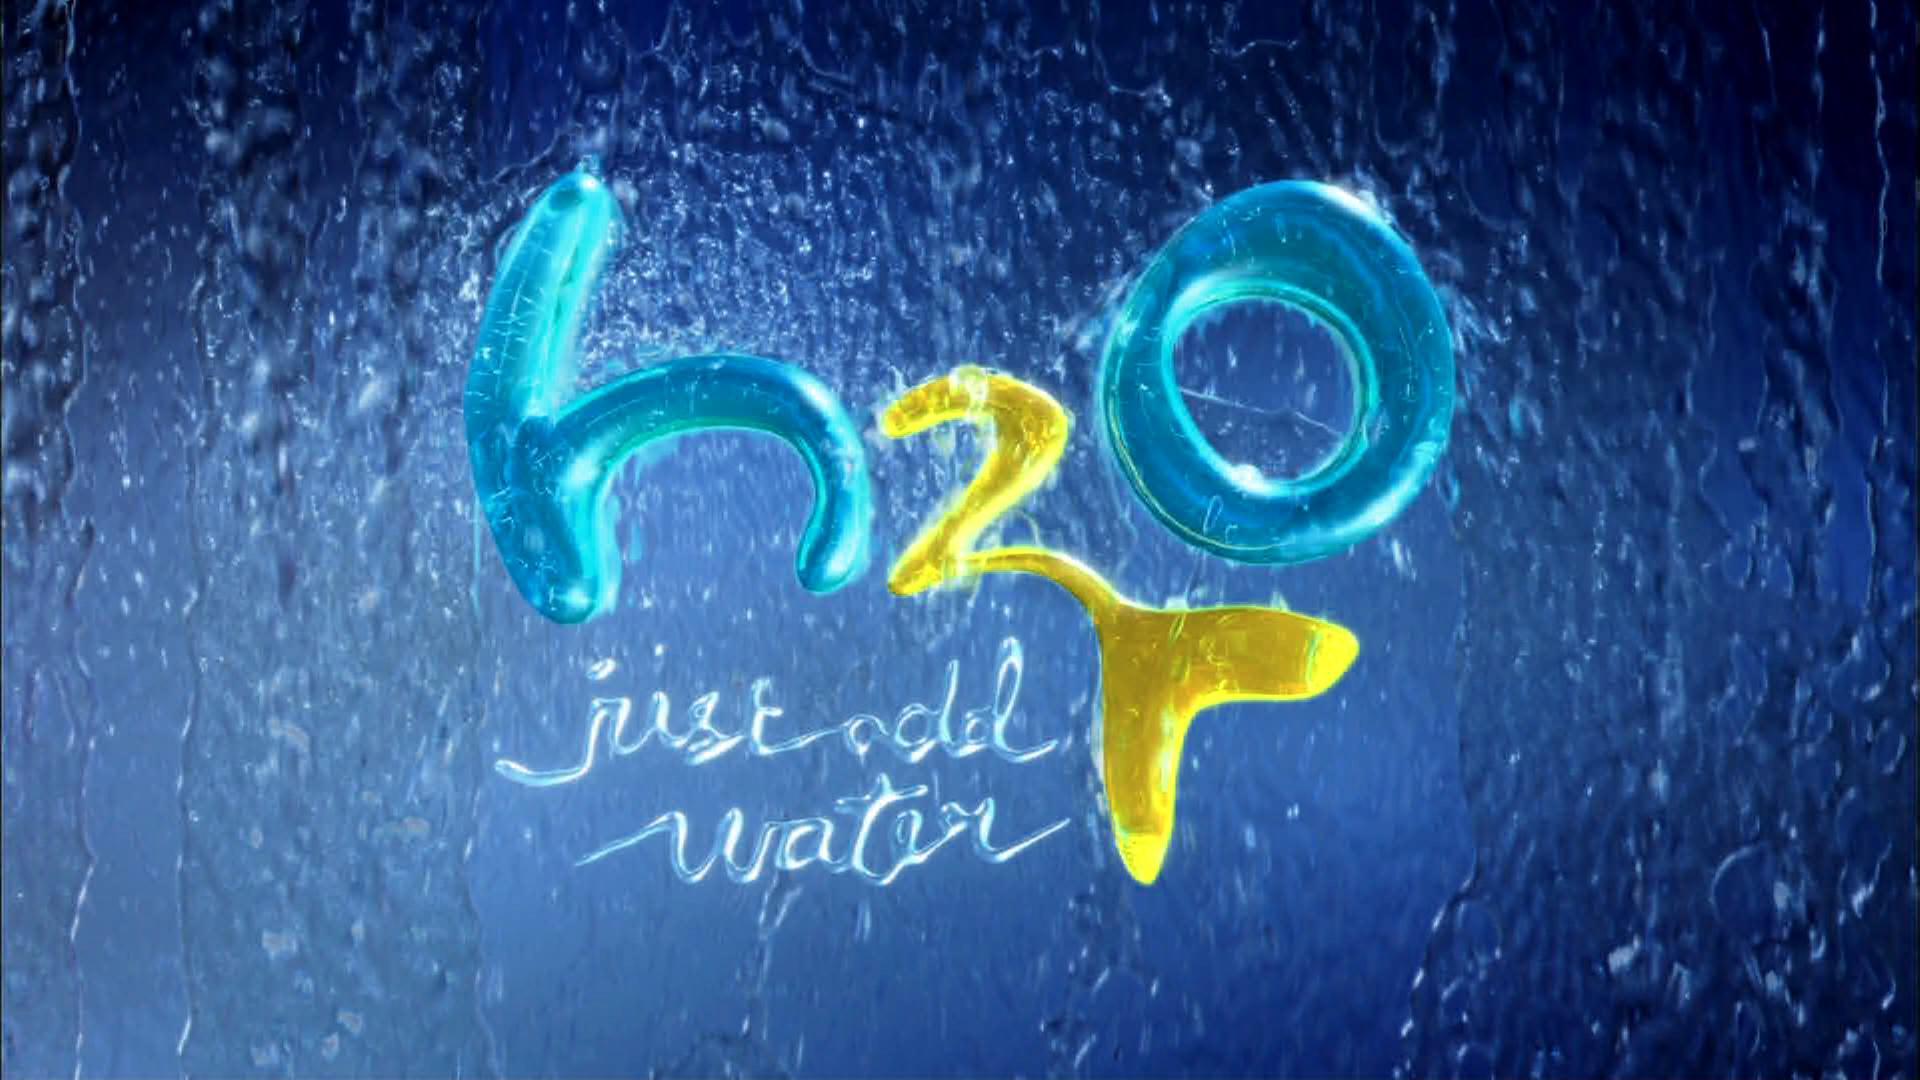 H2o wallpaper wallpapersafari for H2o add water